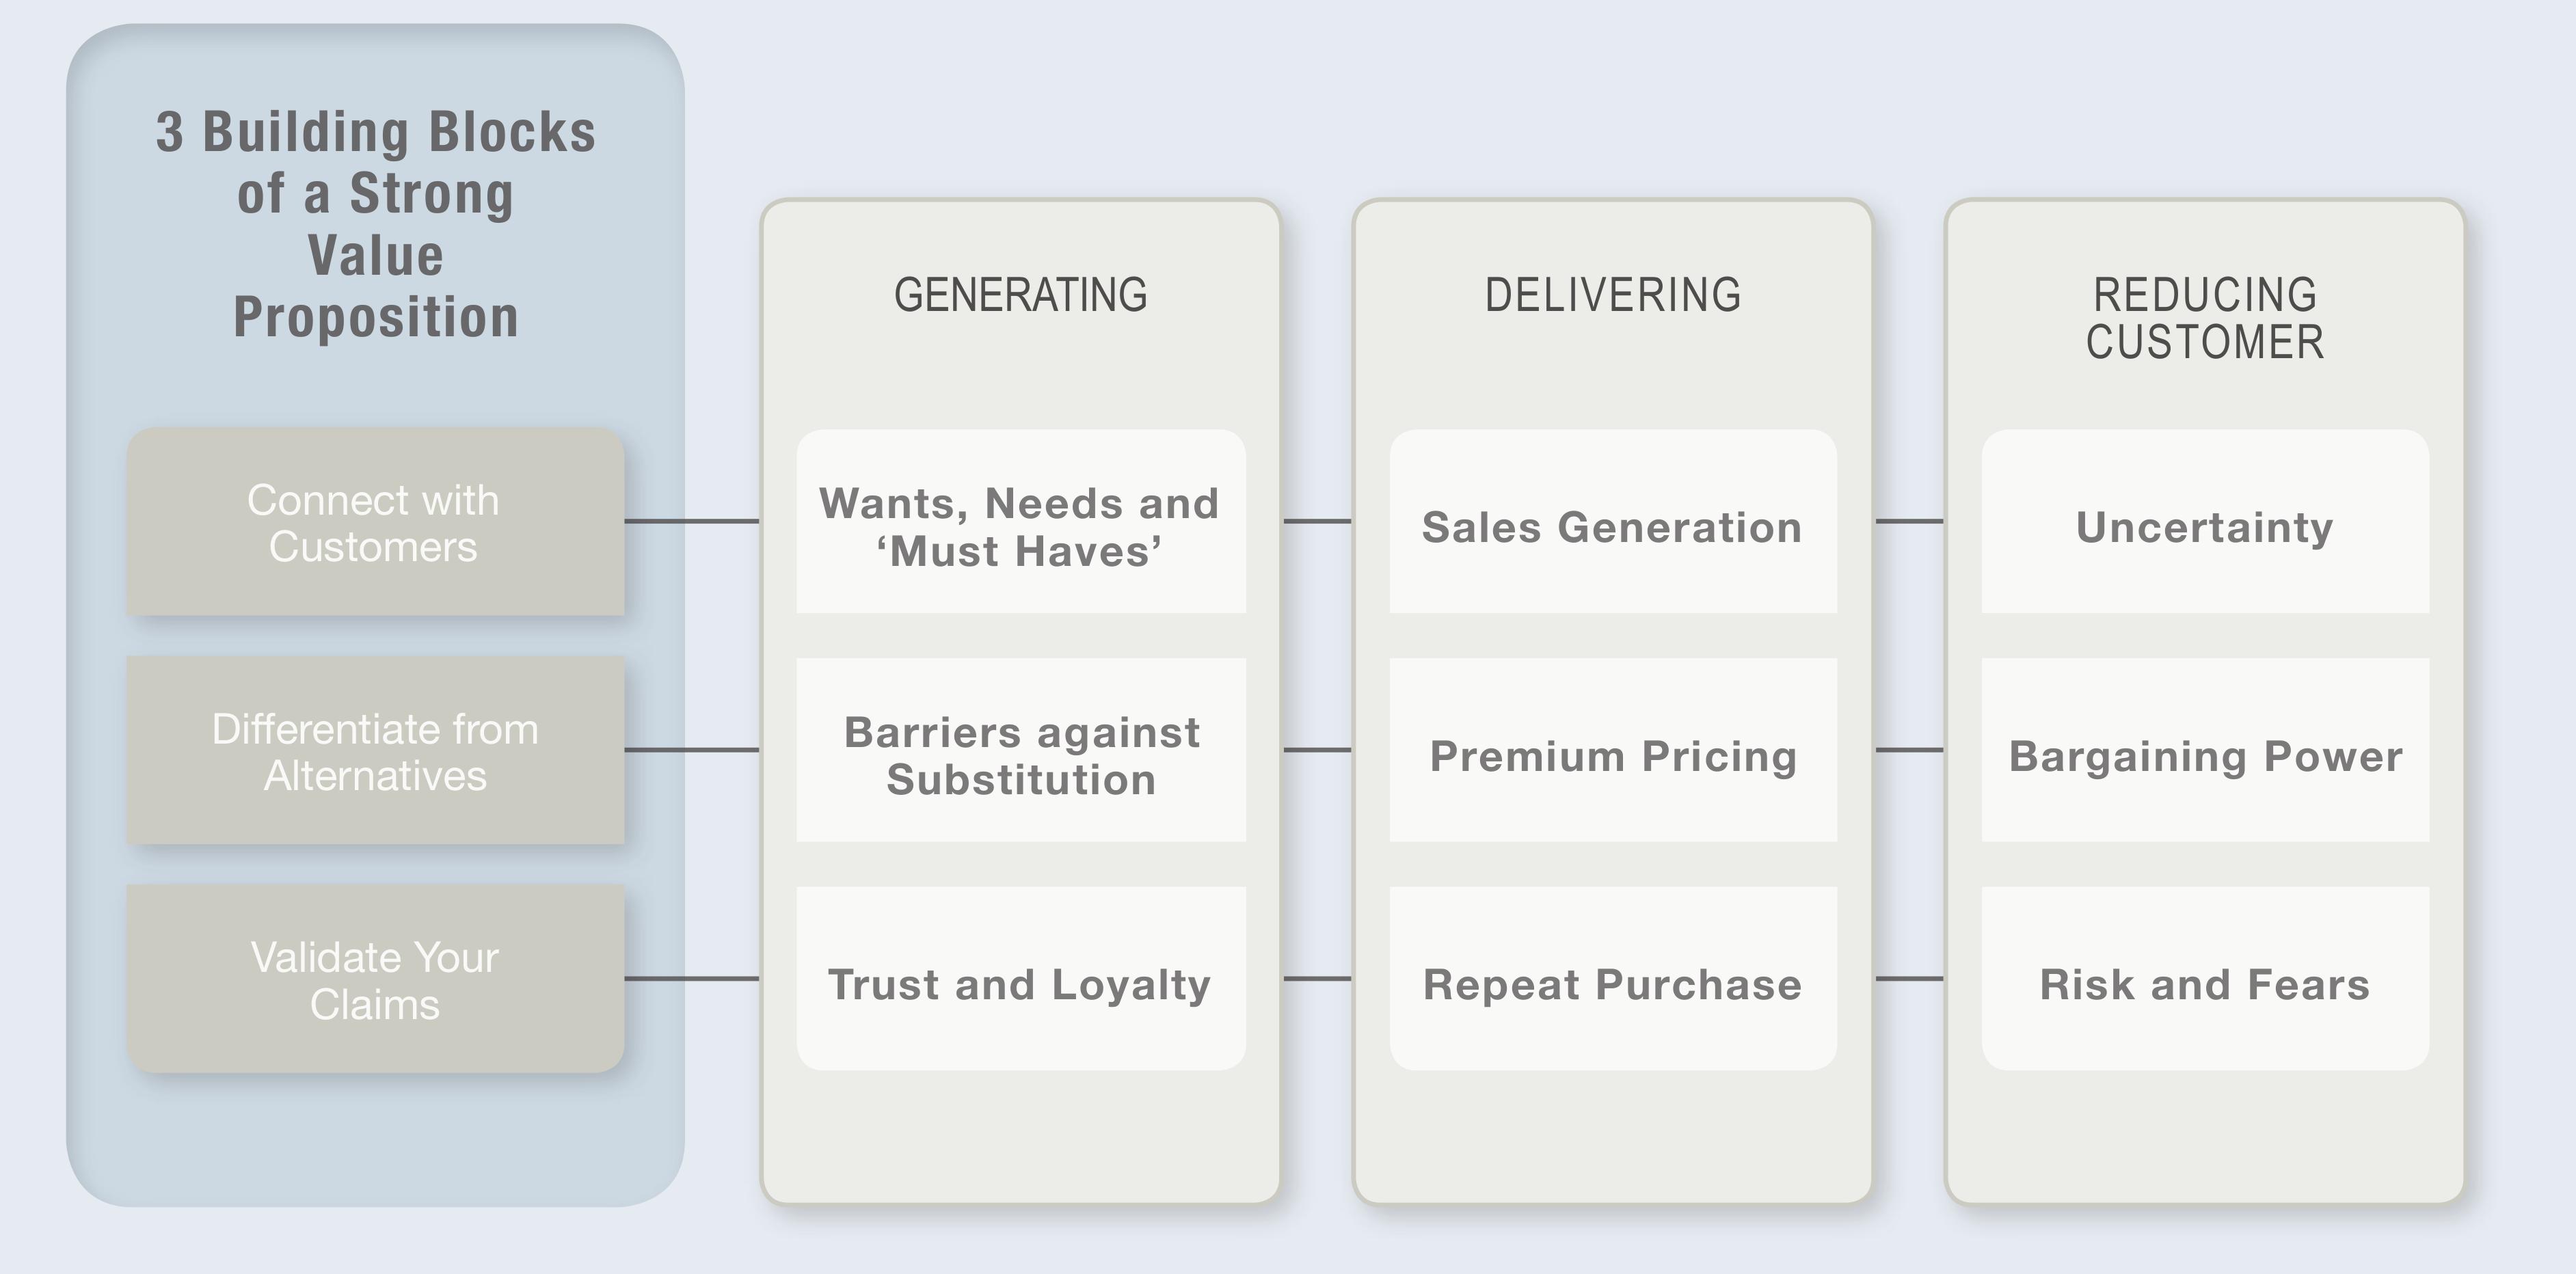 content/images/entrepreneurial-innovation/value-prop-blocks.png